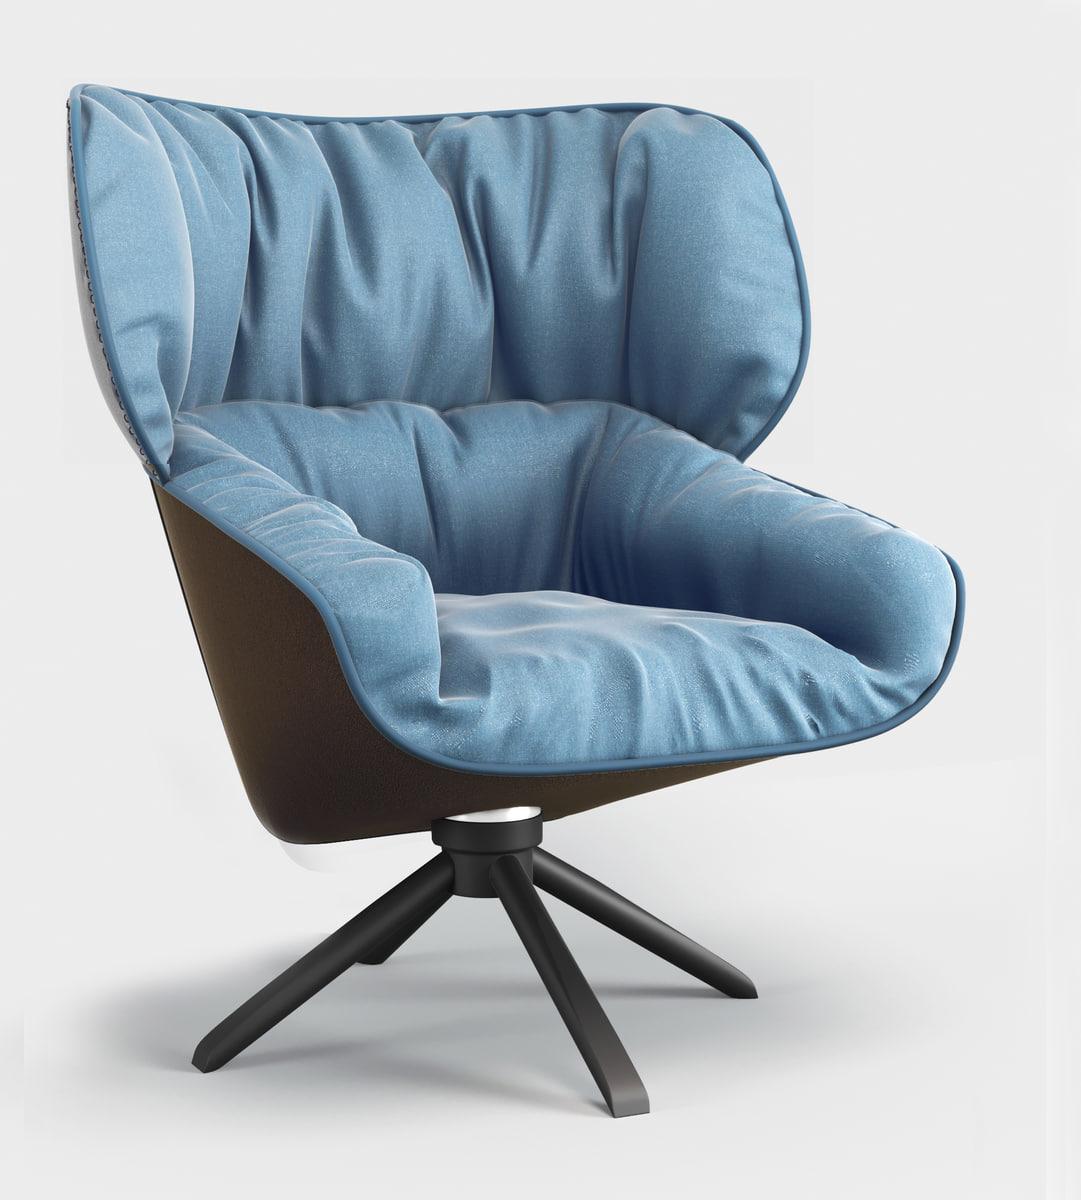 b italia tabano chair 3D